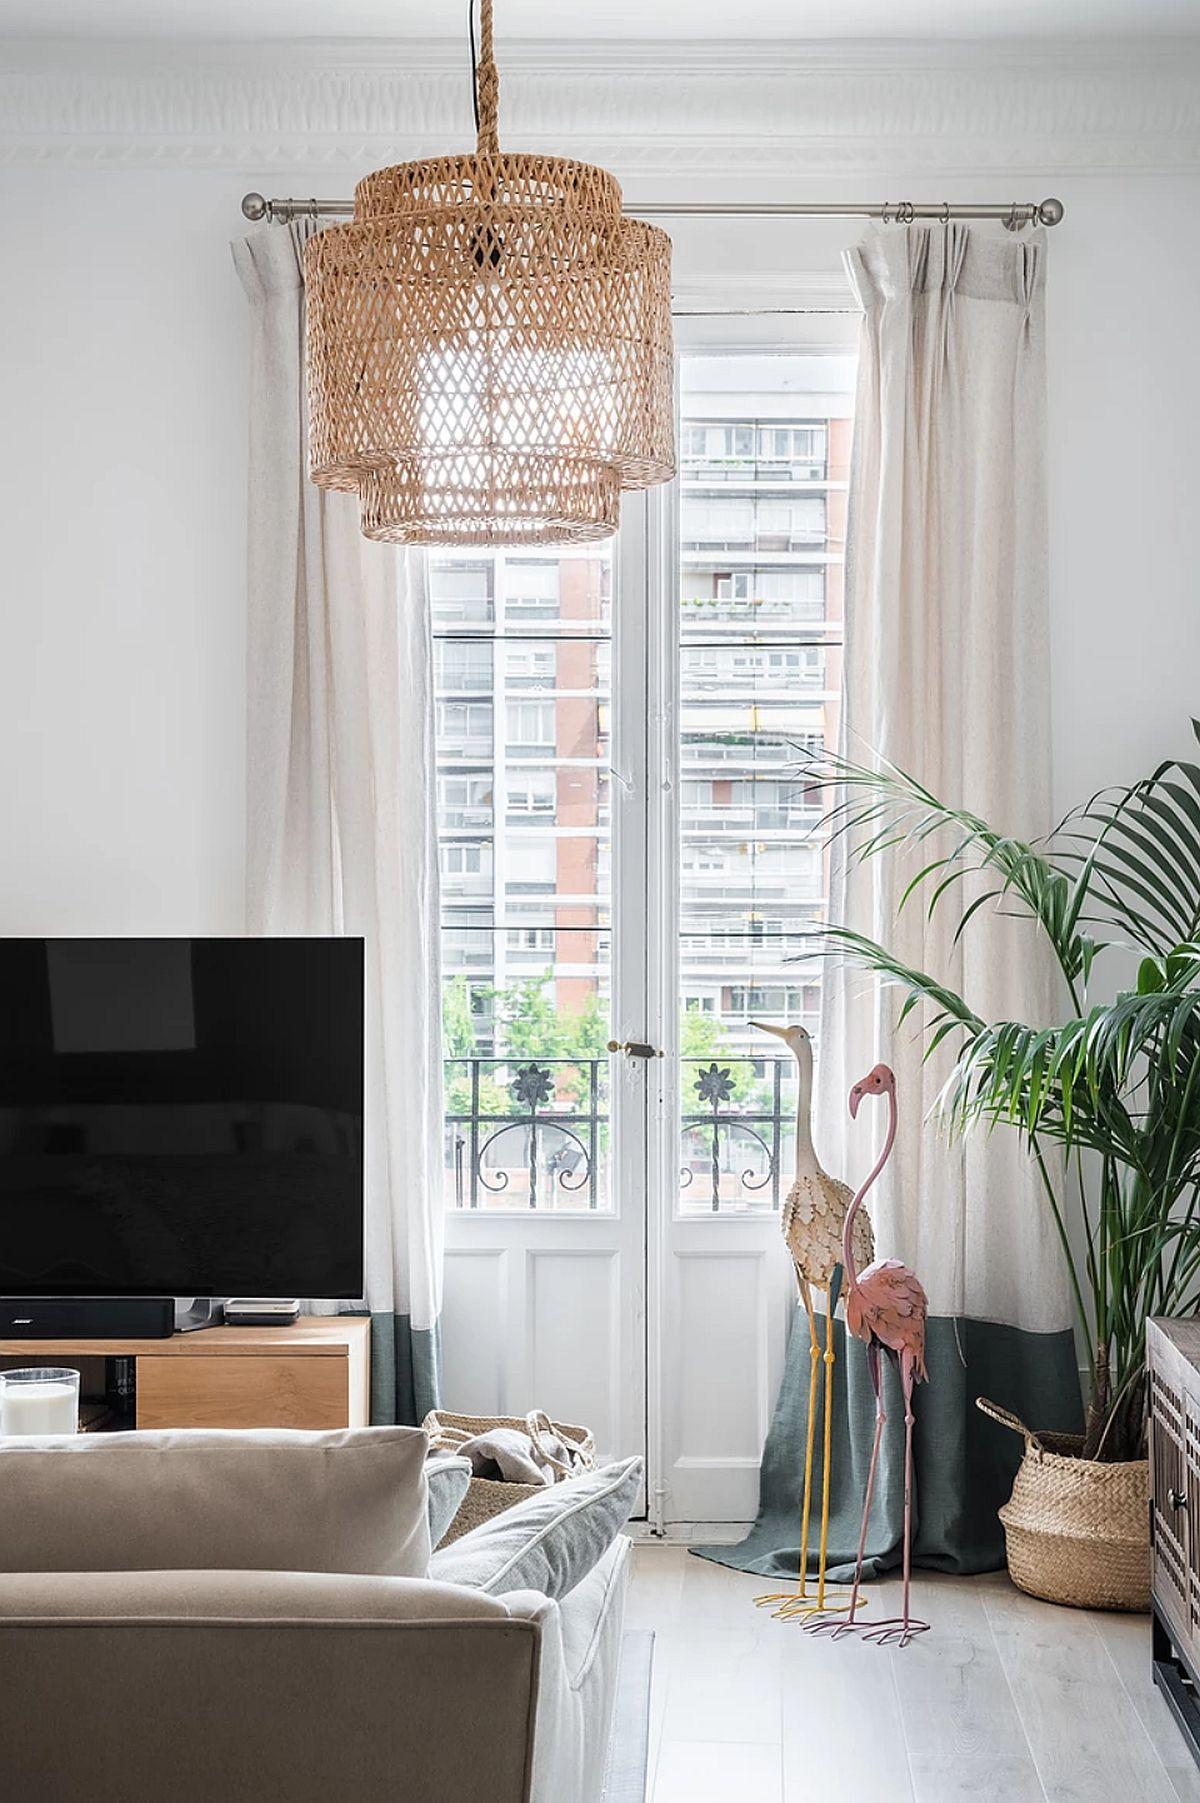 adelaparvu.com despre amenajare apartament in stil urban jungle, design Hoc Volo, Foto Javier Bravo si Felipe Schefell (9)